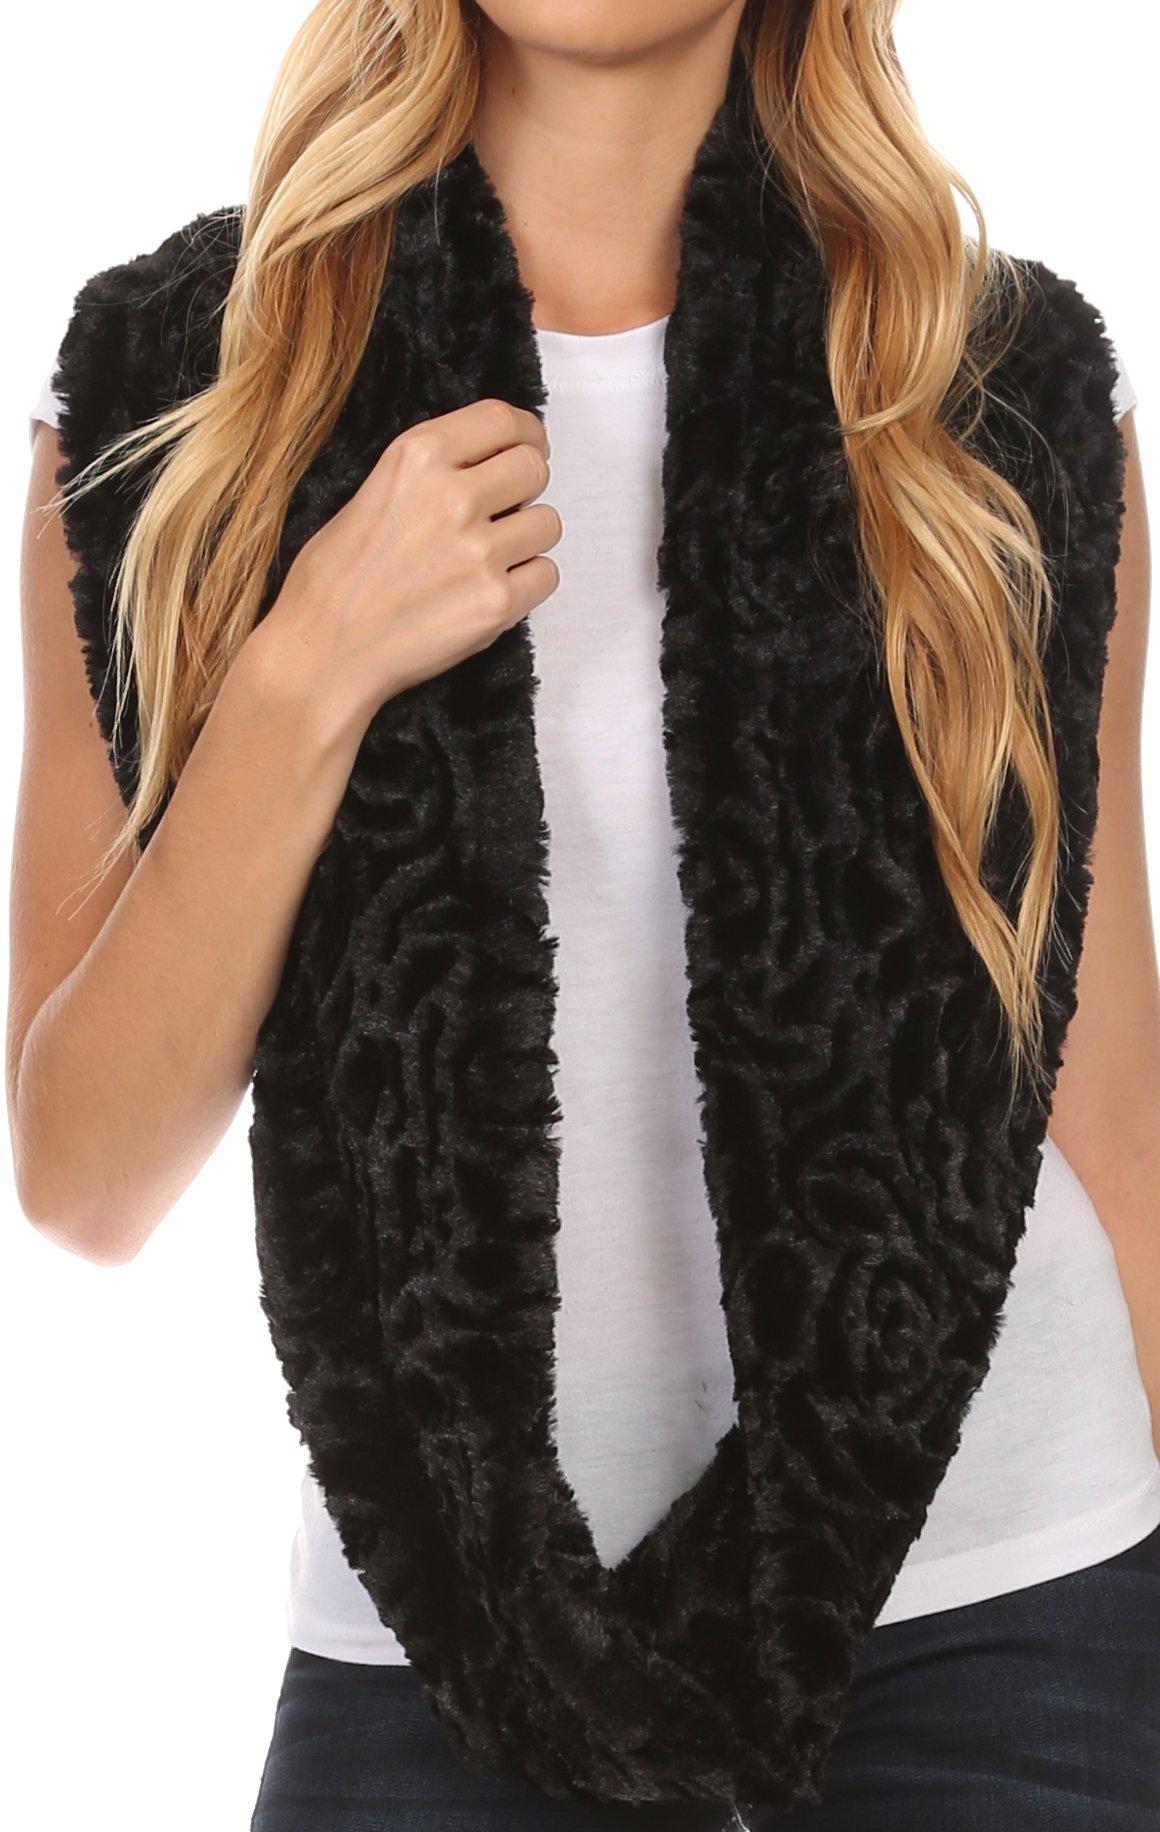 Sakkas 16102 - Mellah Long Wide Soft Fuzzy Furry Fur Infinity Fall Winter Wrap Scarf - Black - OS